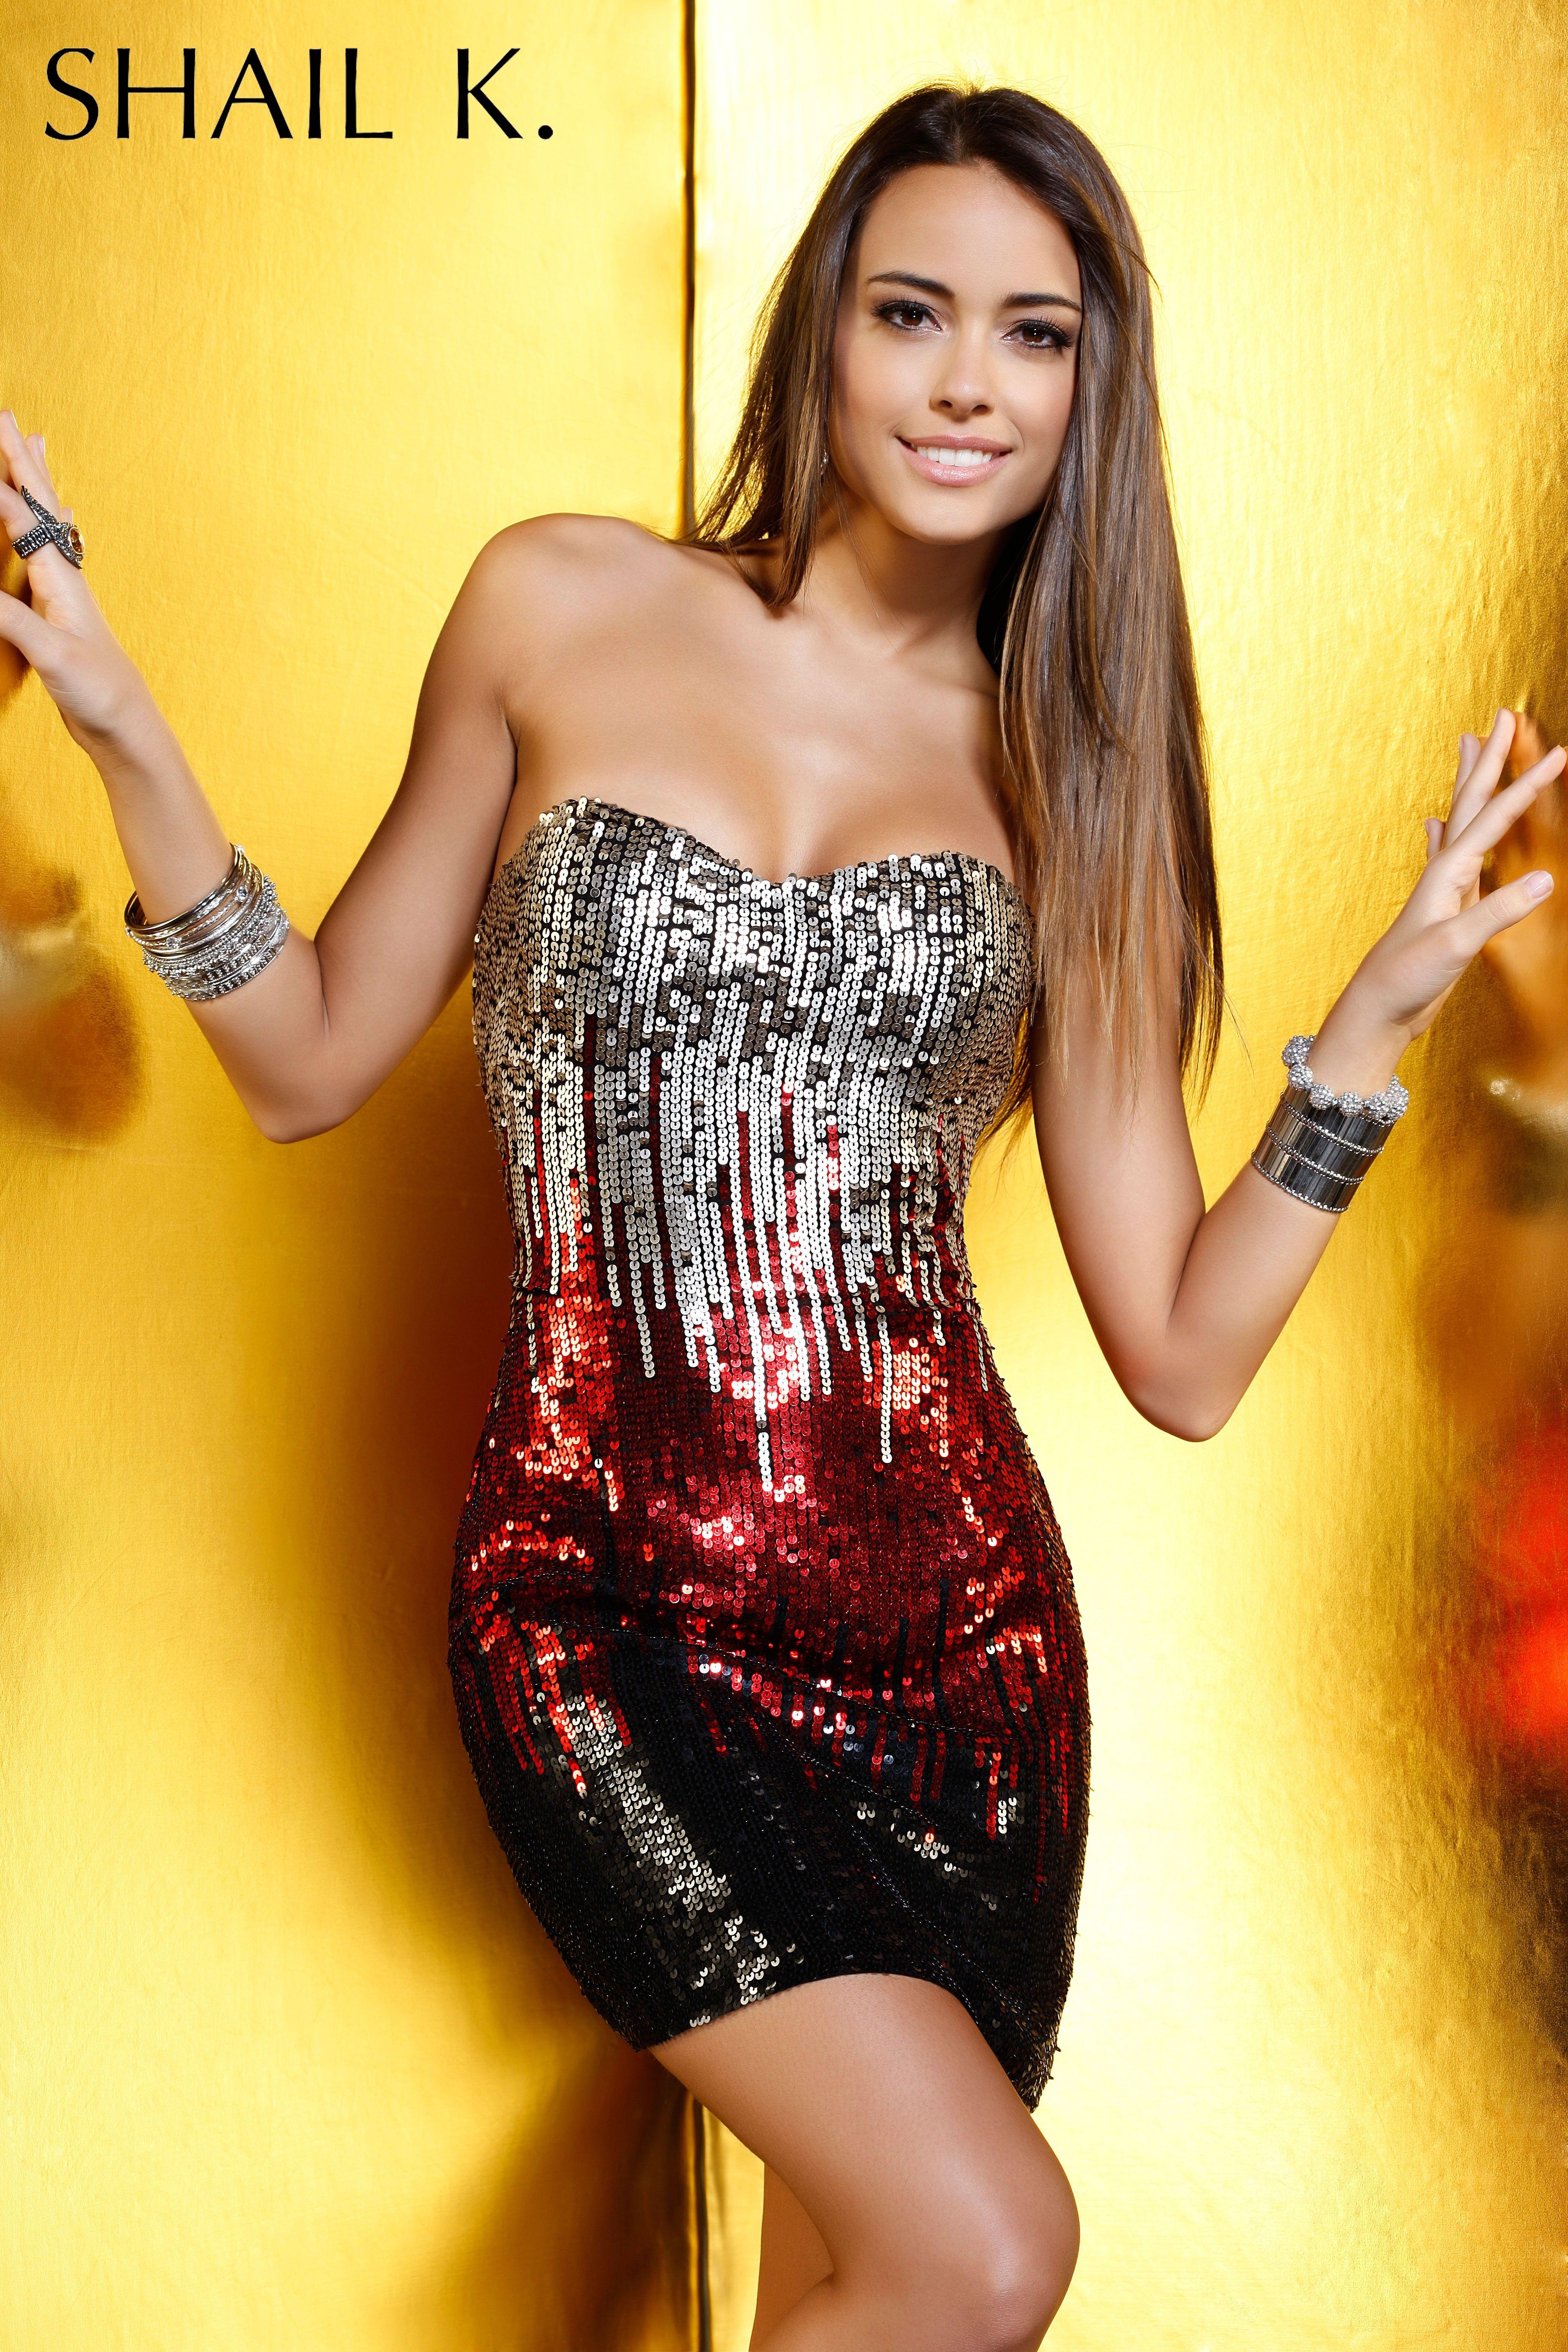 Shail k kk sequined strapless homecoming dress rissyroos